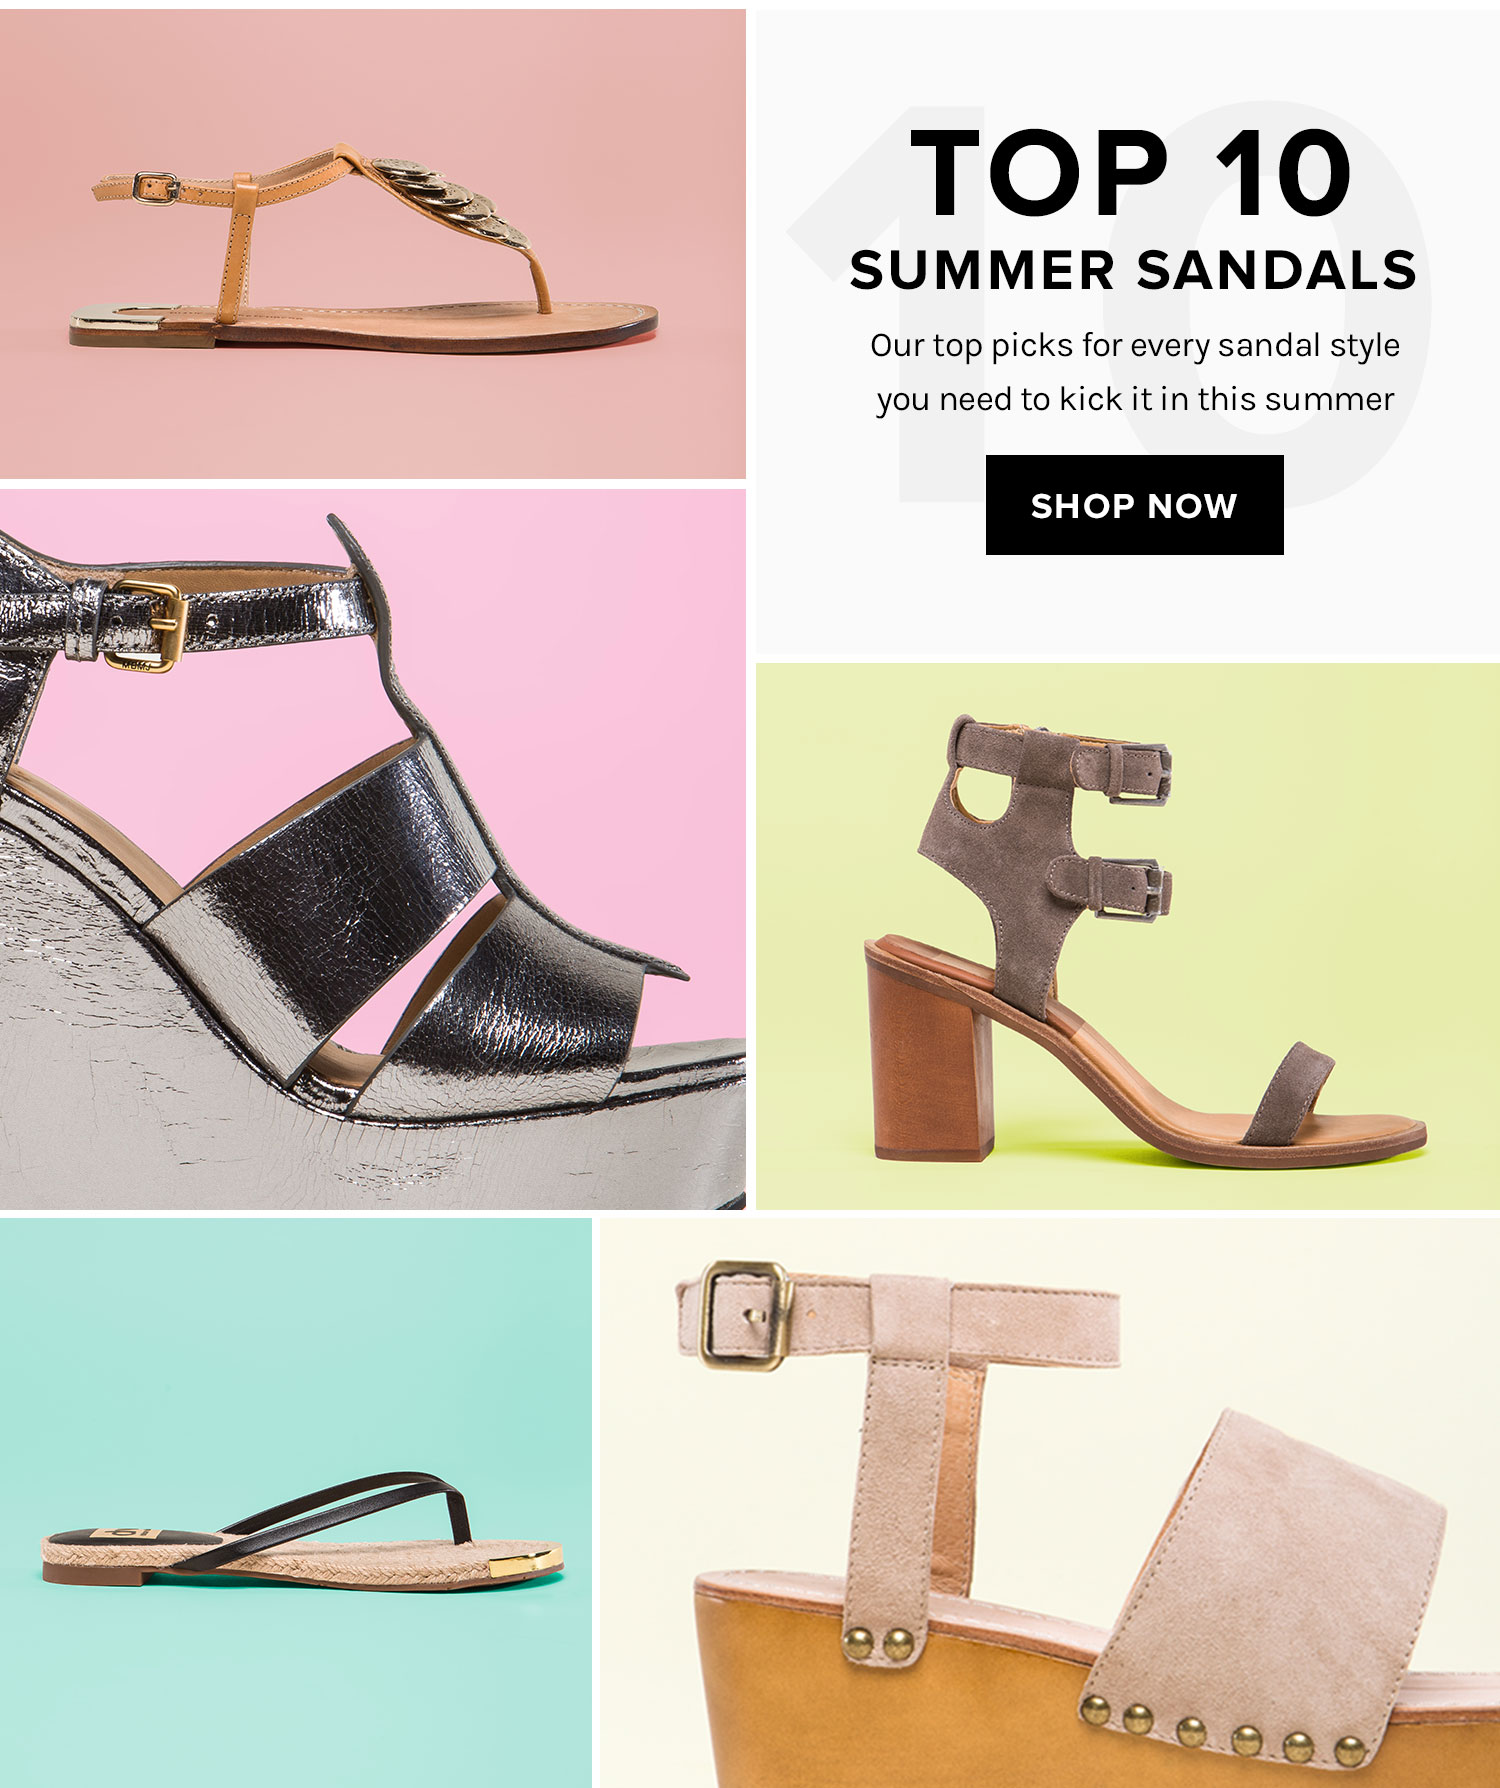 Top 10 Summer Sandals